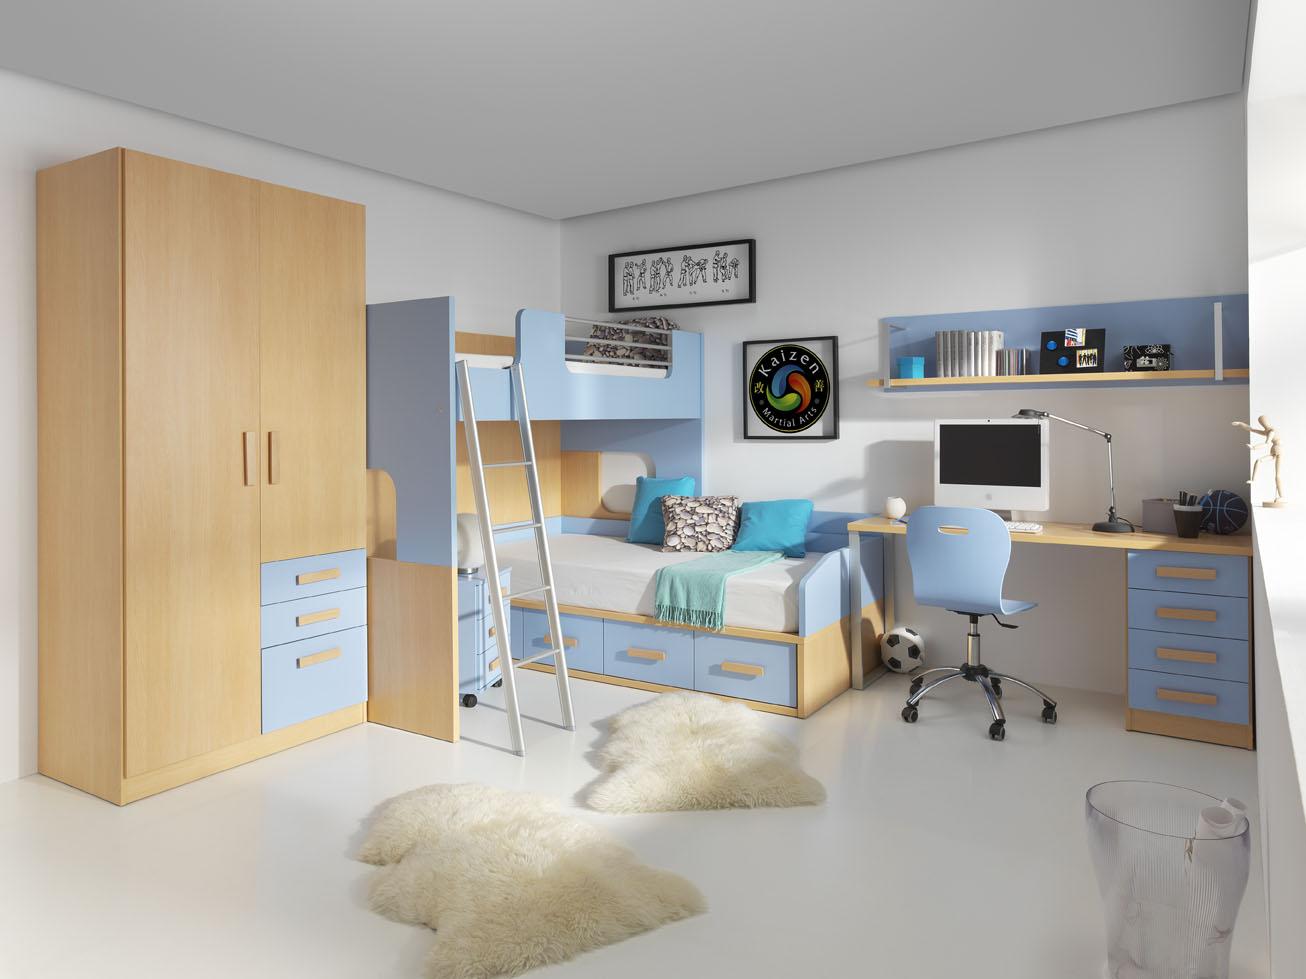 Muebles Orts Base.2 Dormitorio Juvenil 177